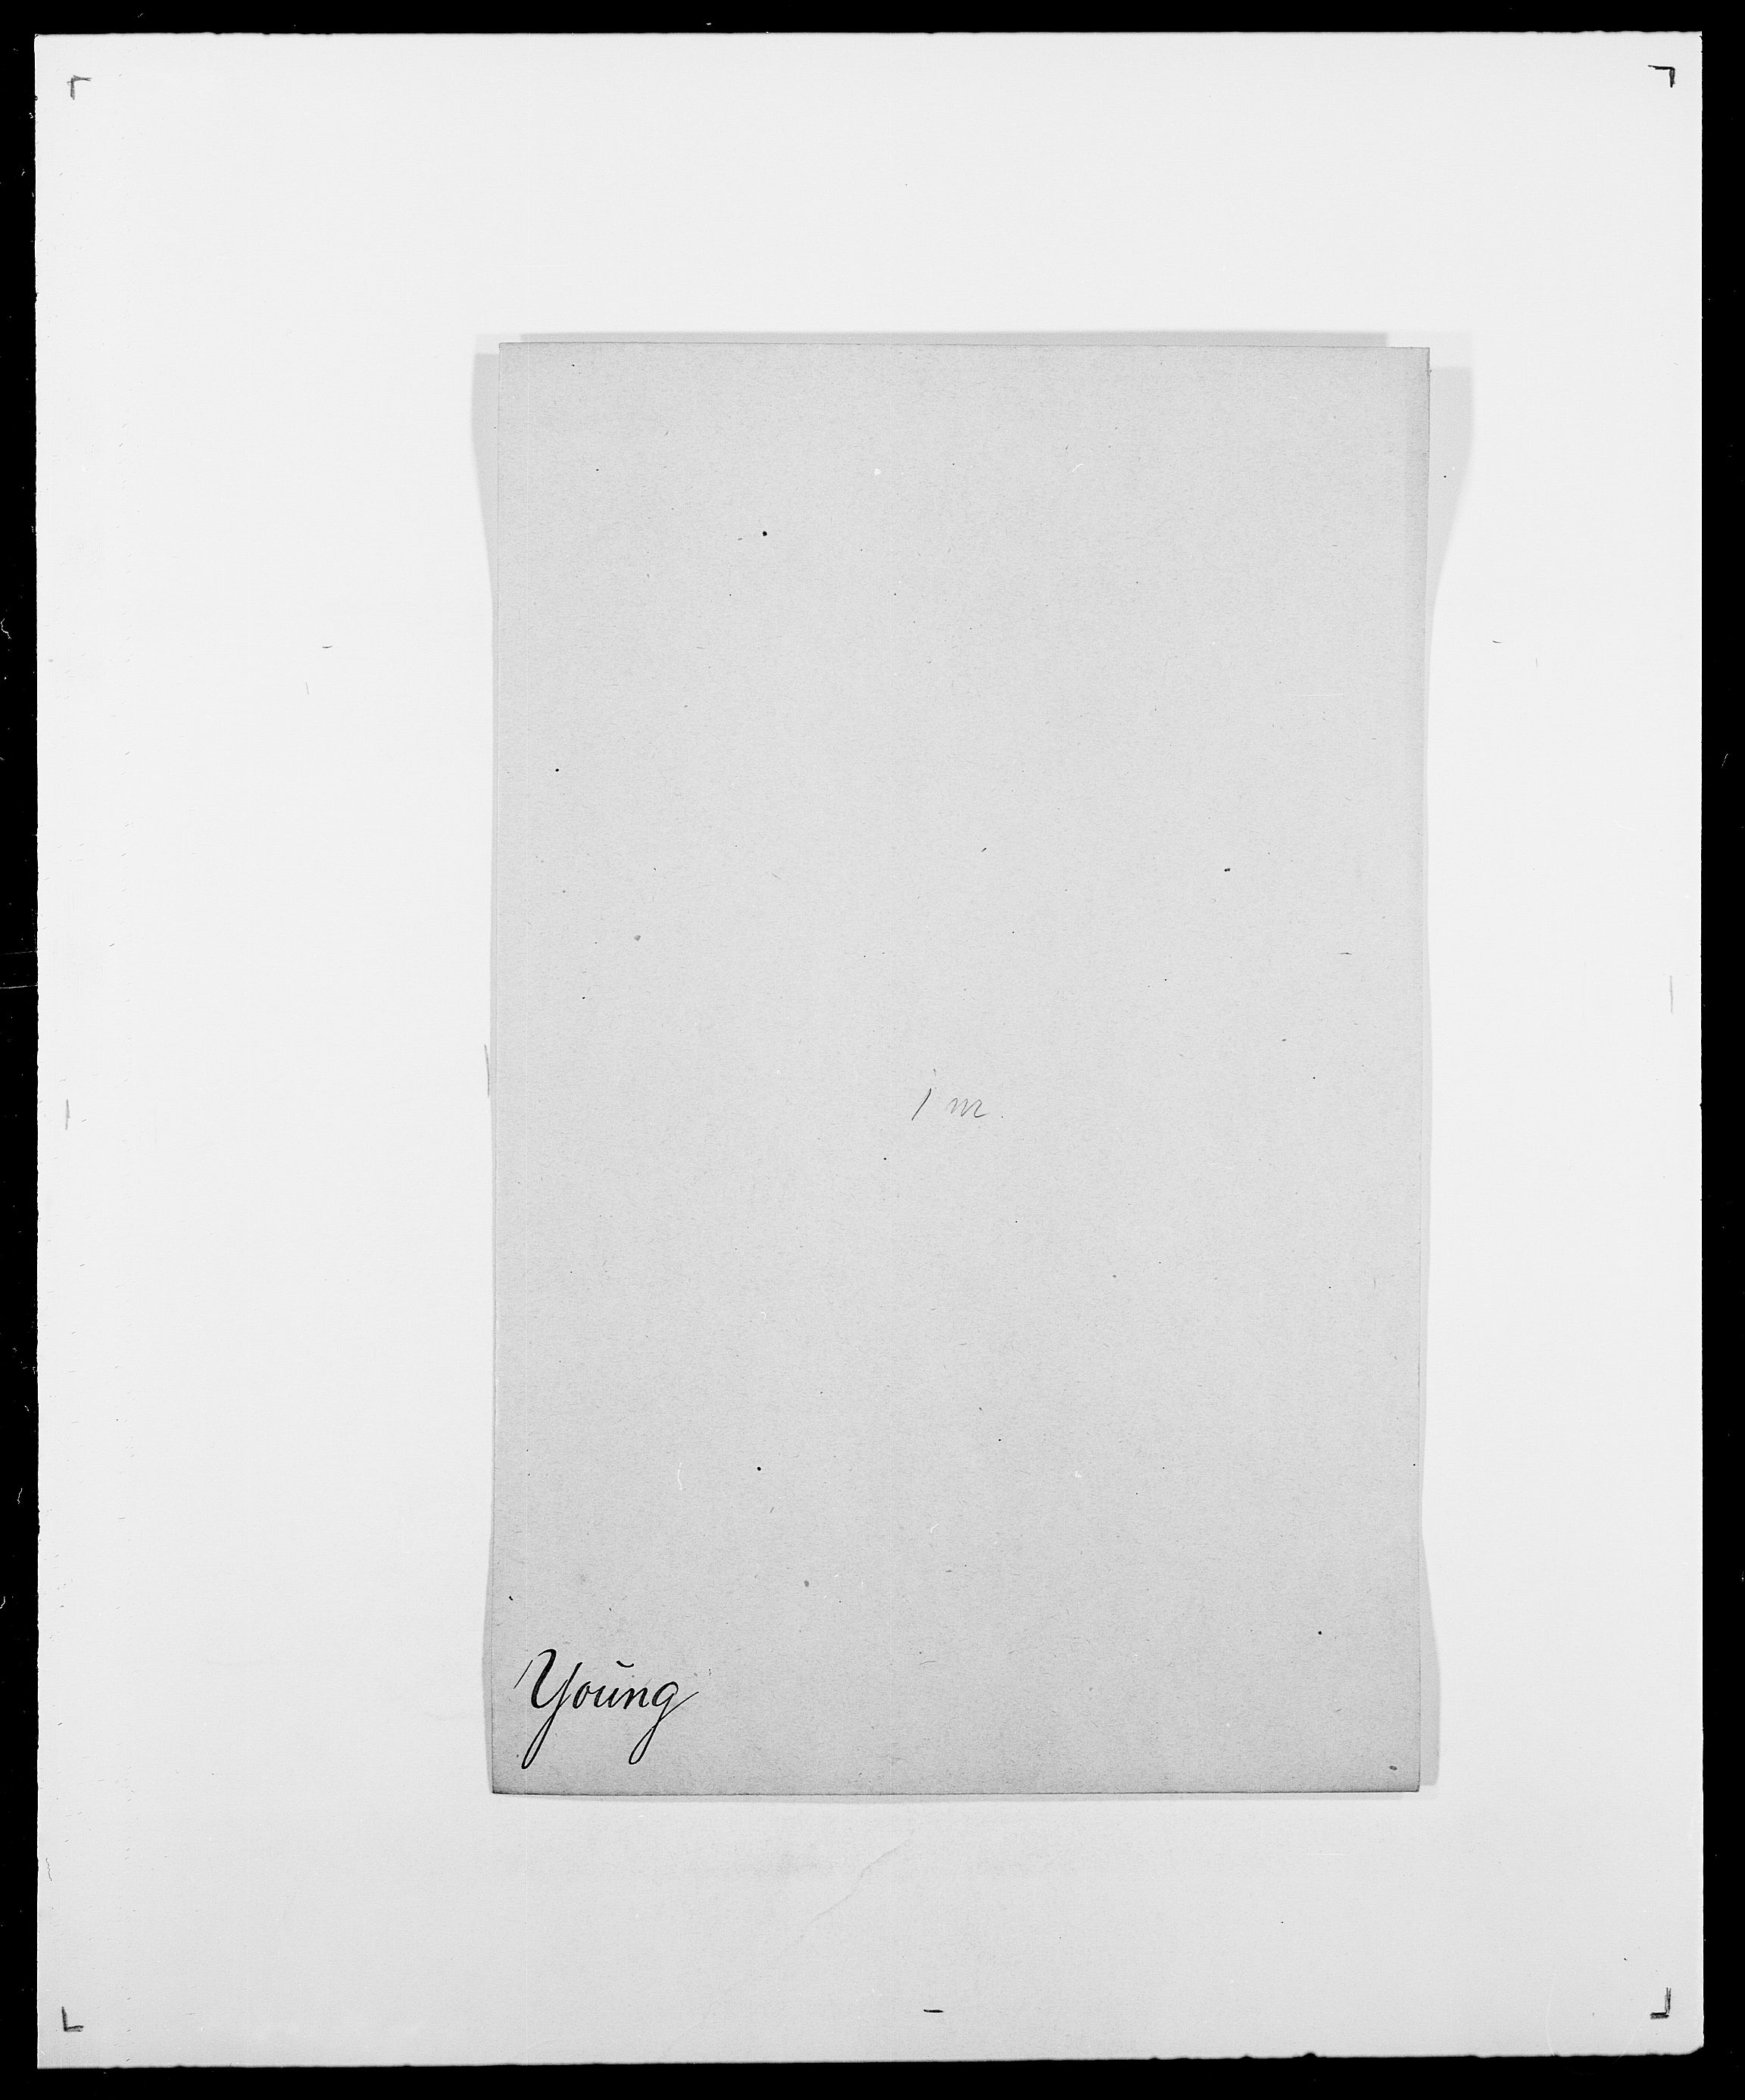 SAO, Delgobe, Charles Antoine - samling, D/Da/L0043: Wulfsberg - v. Zanten, s. 49